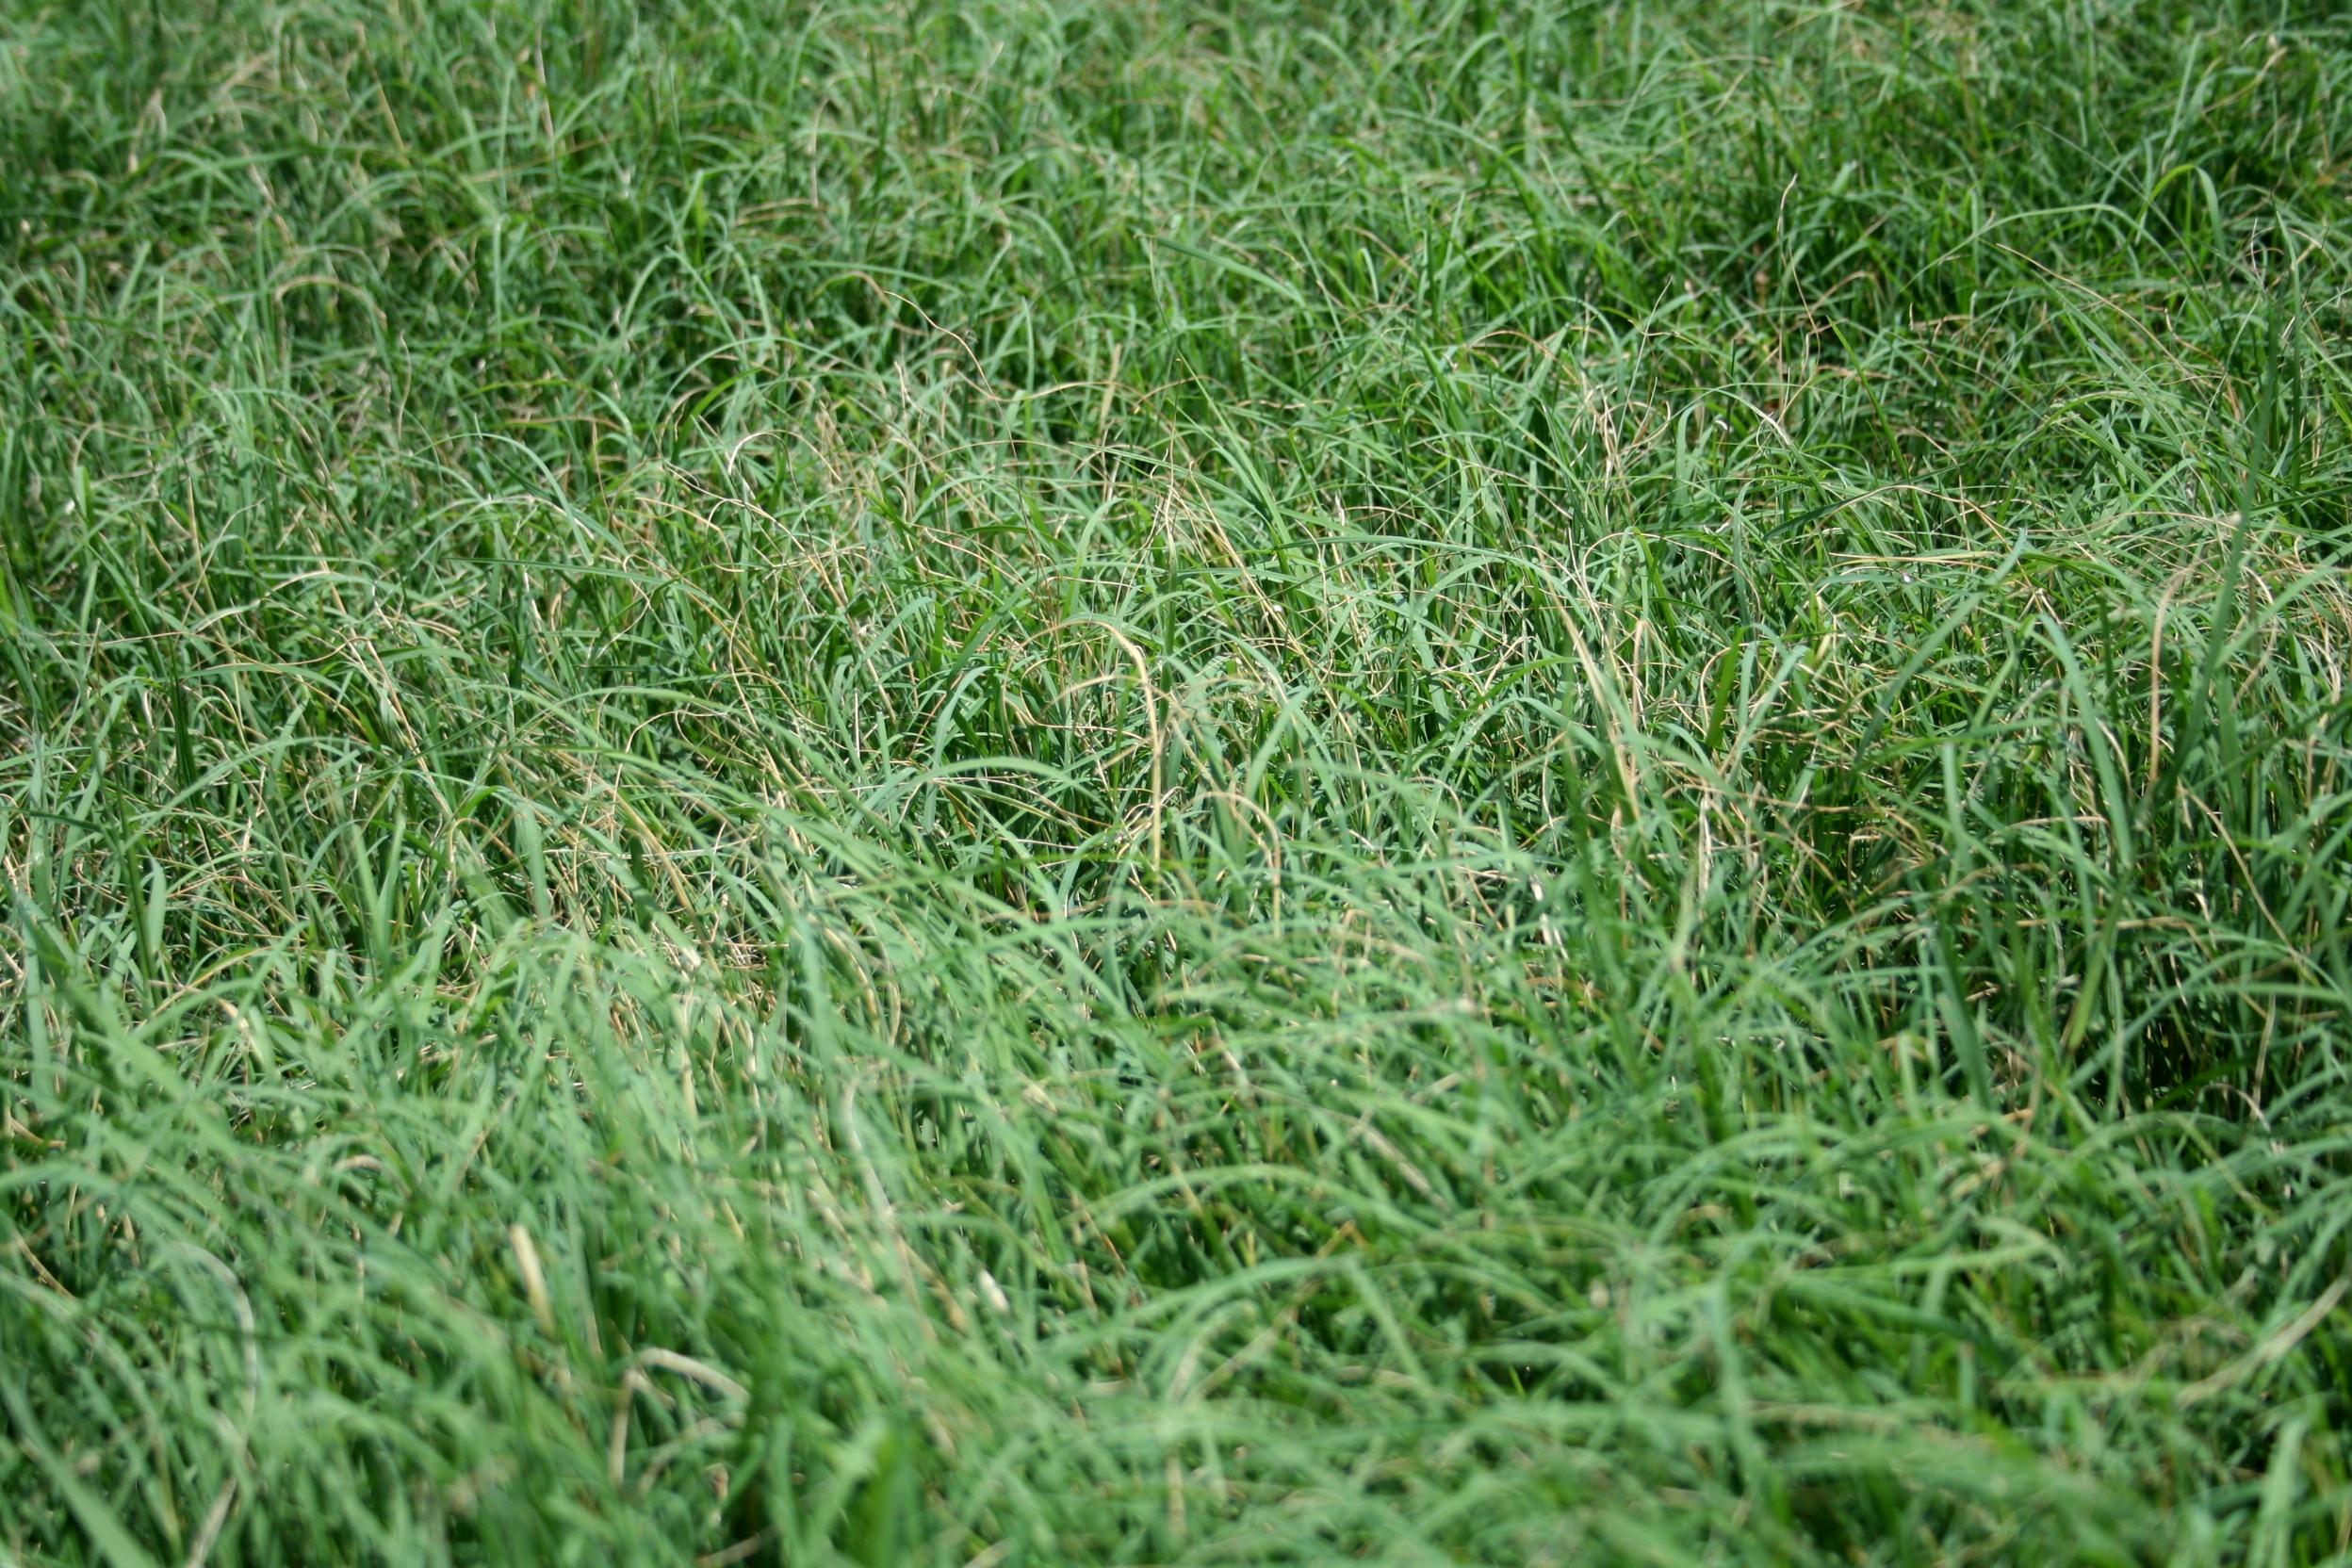 Stem Maggot Damage To Bermuda Grass Agrilife Today